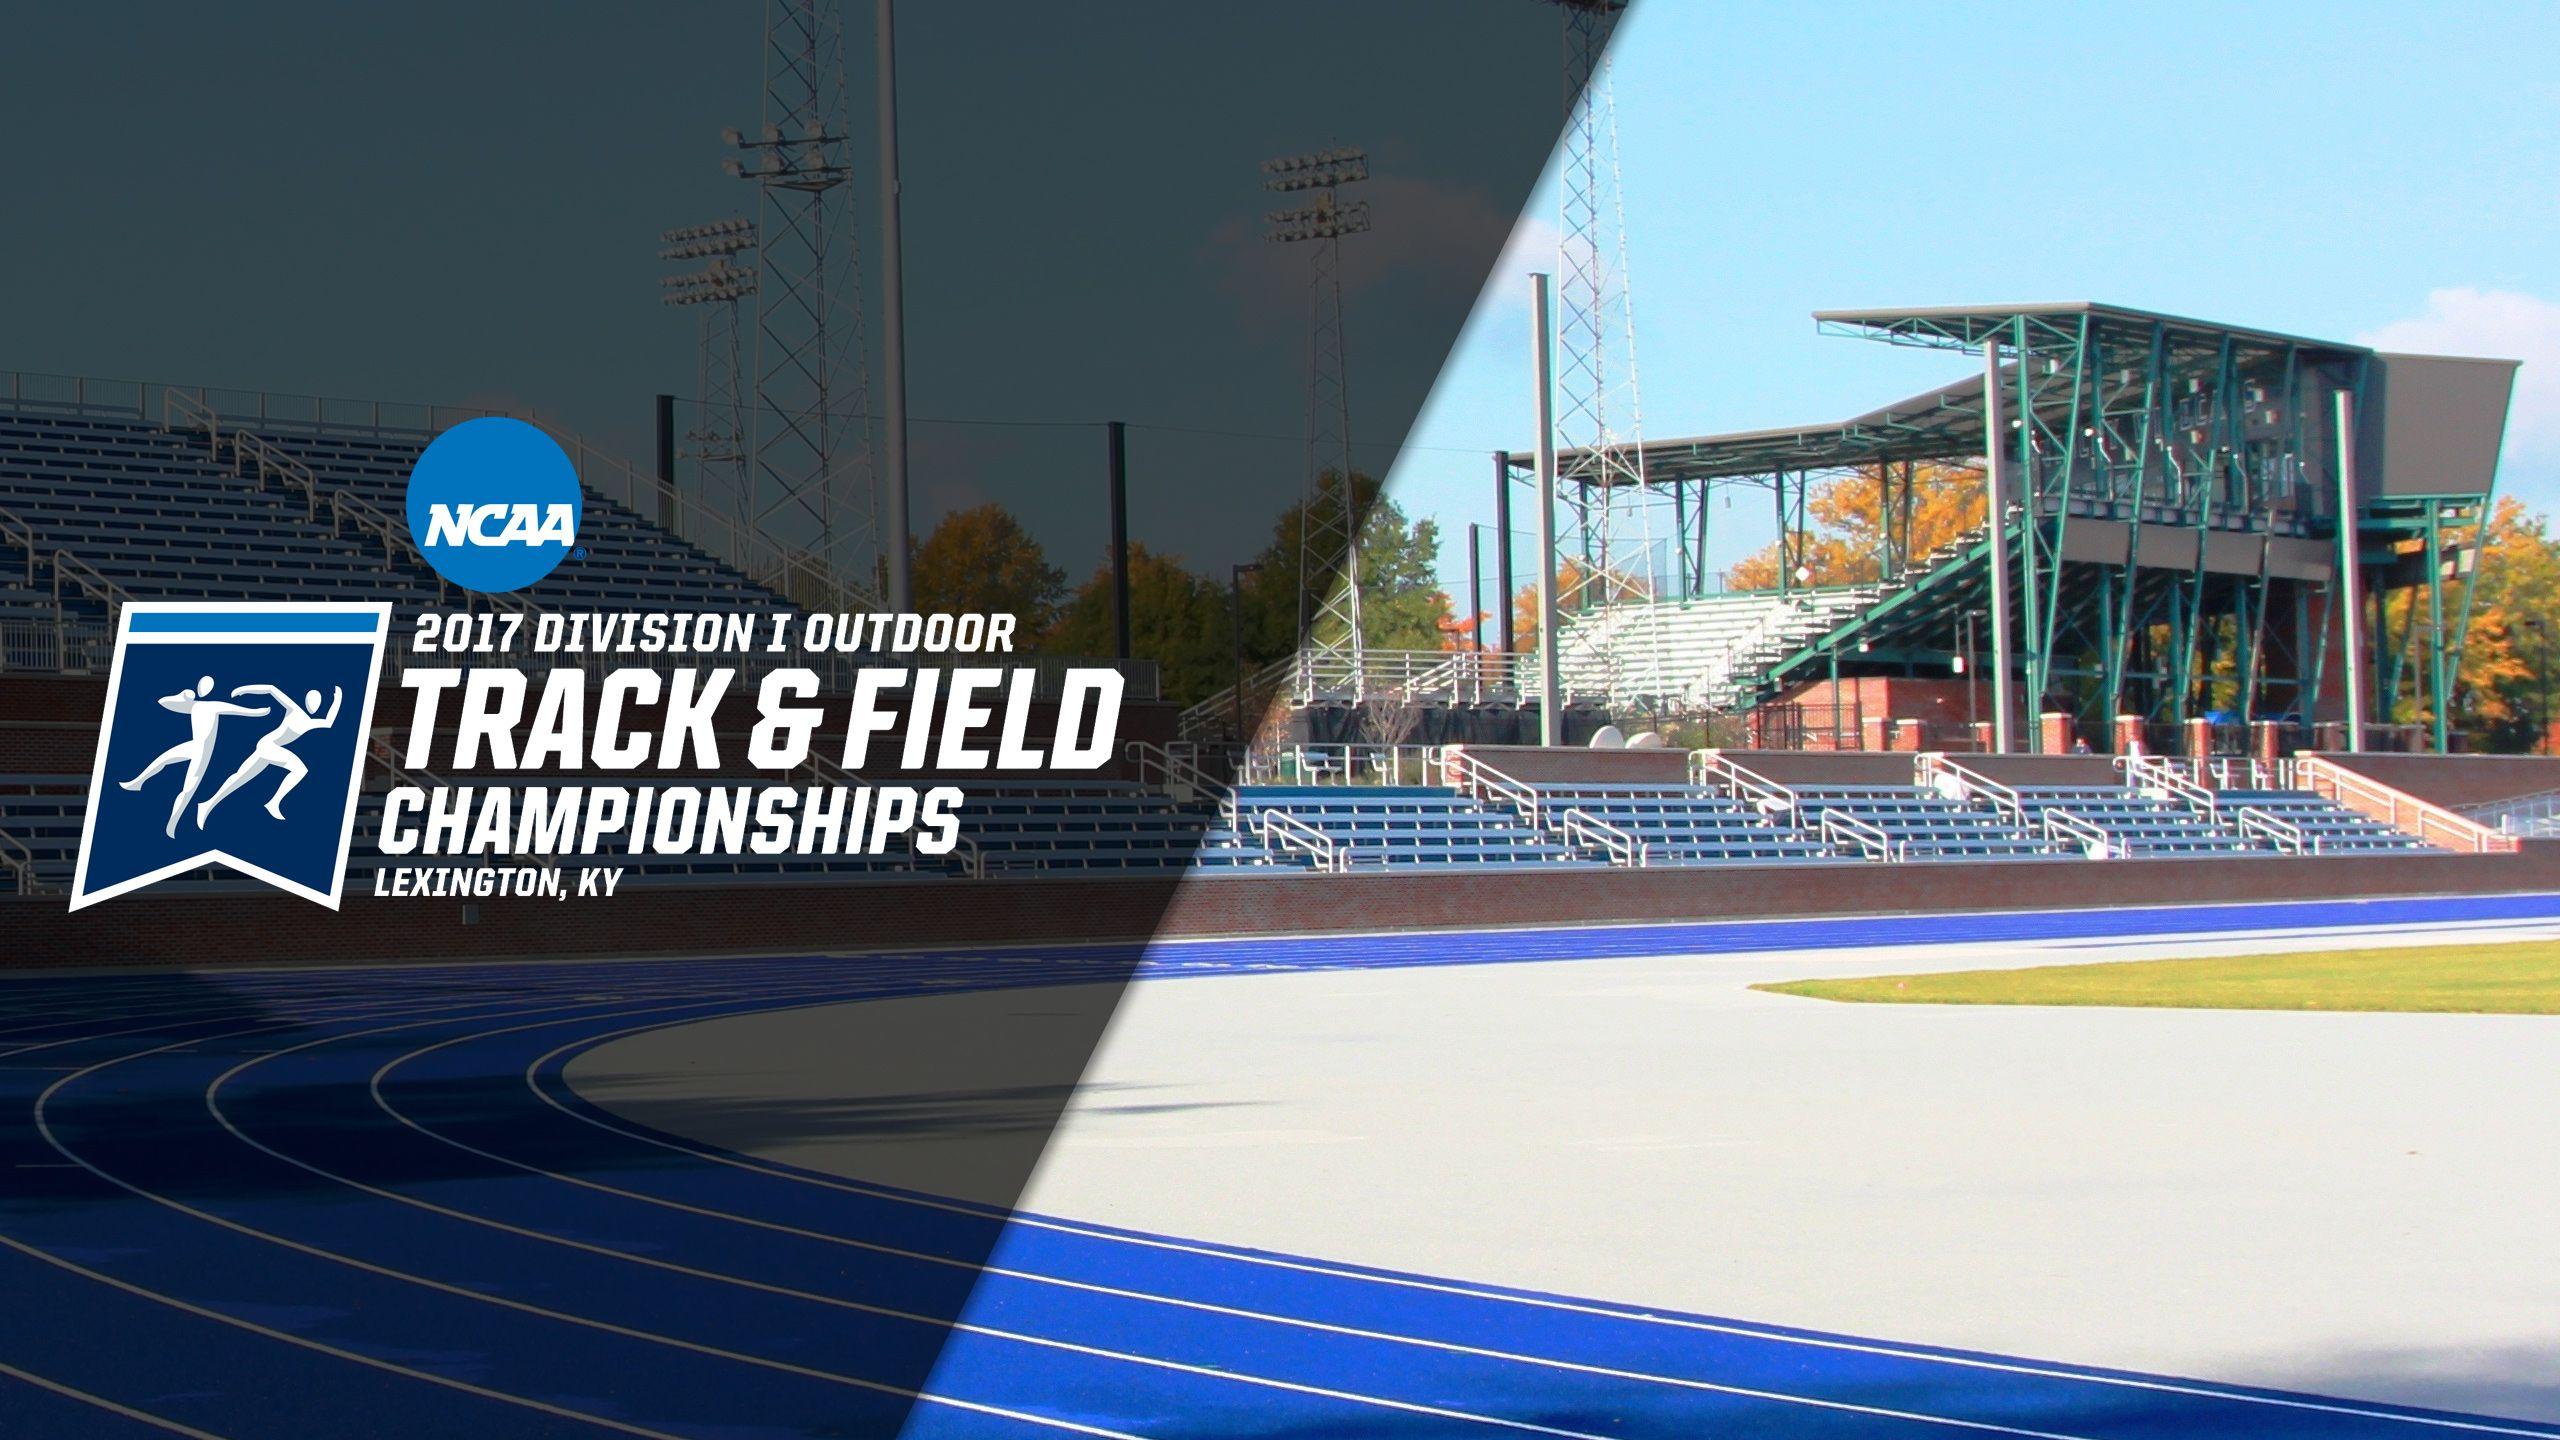 2017 NCAA Outdoor Track & Field Championship